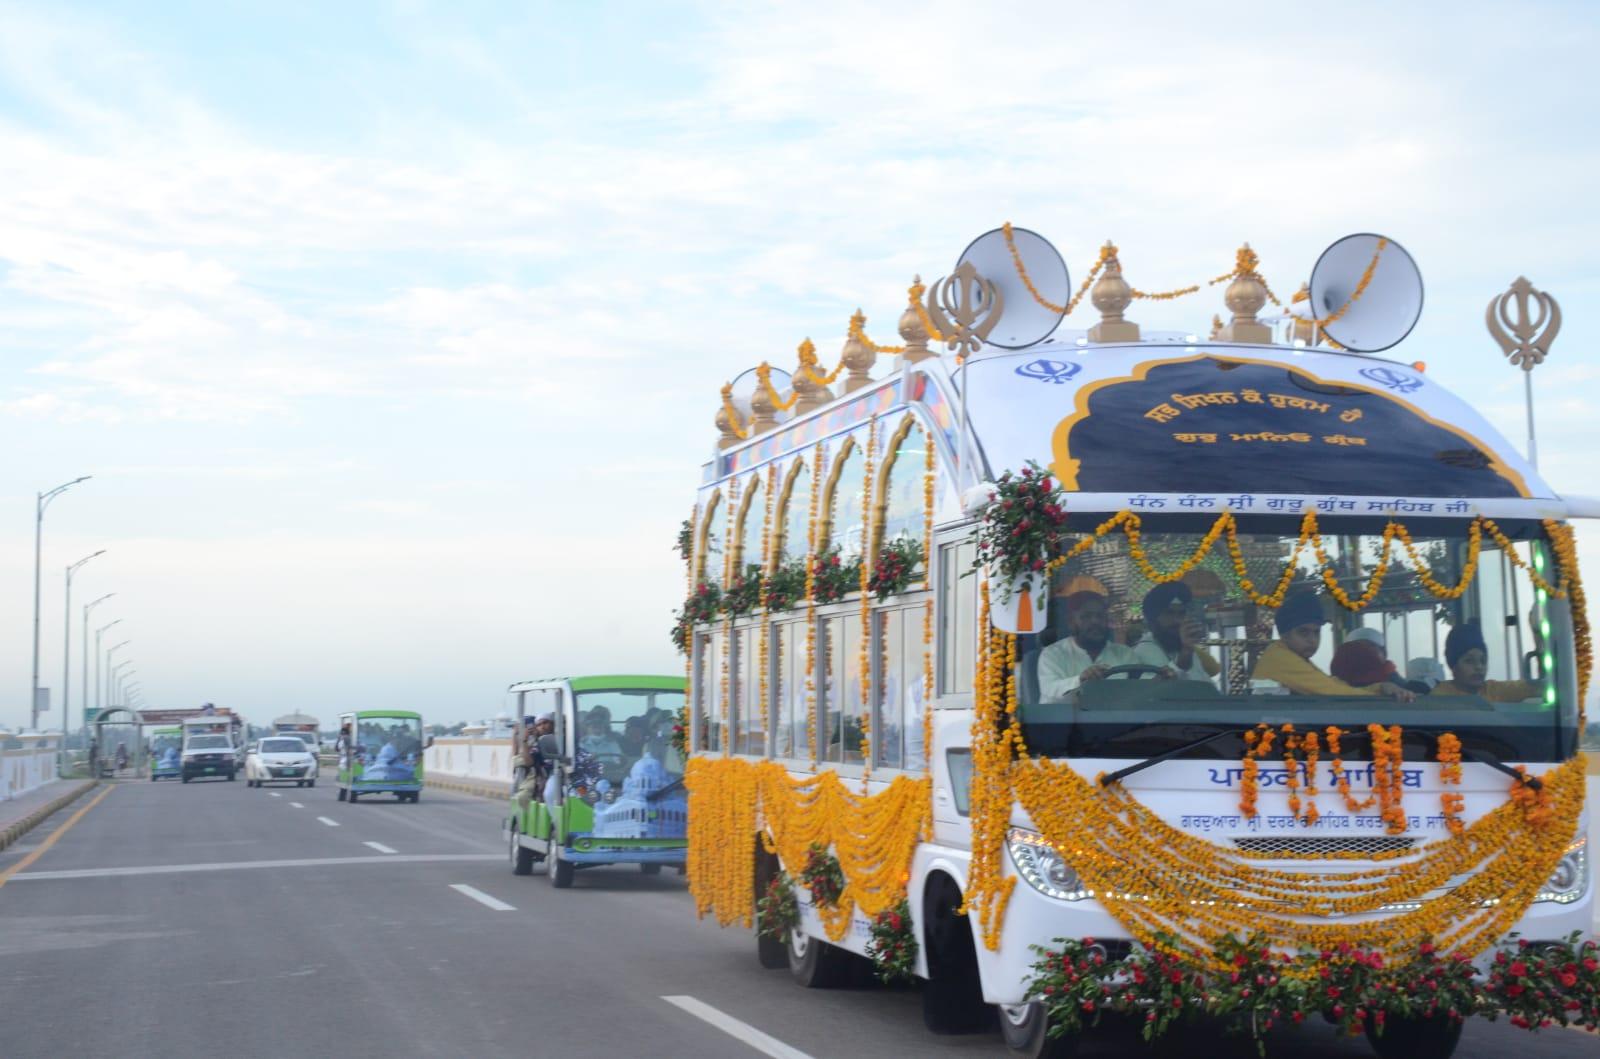 Nagar Keertan was carried out from Gurdwara Darbar Sahib Kartarpur till Zero line